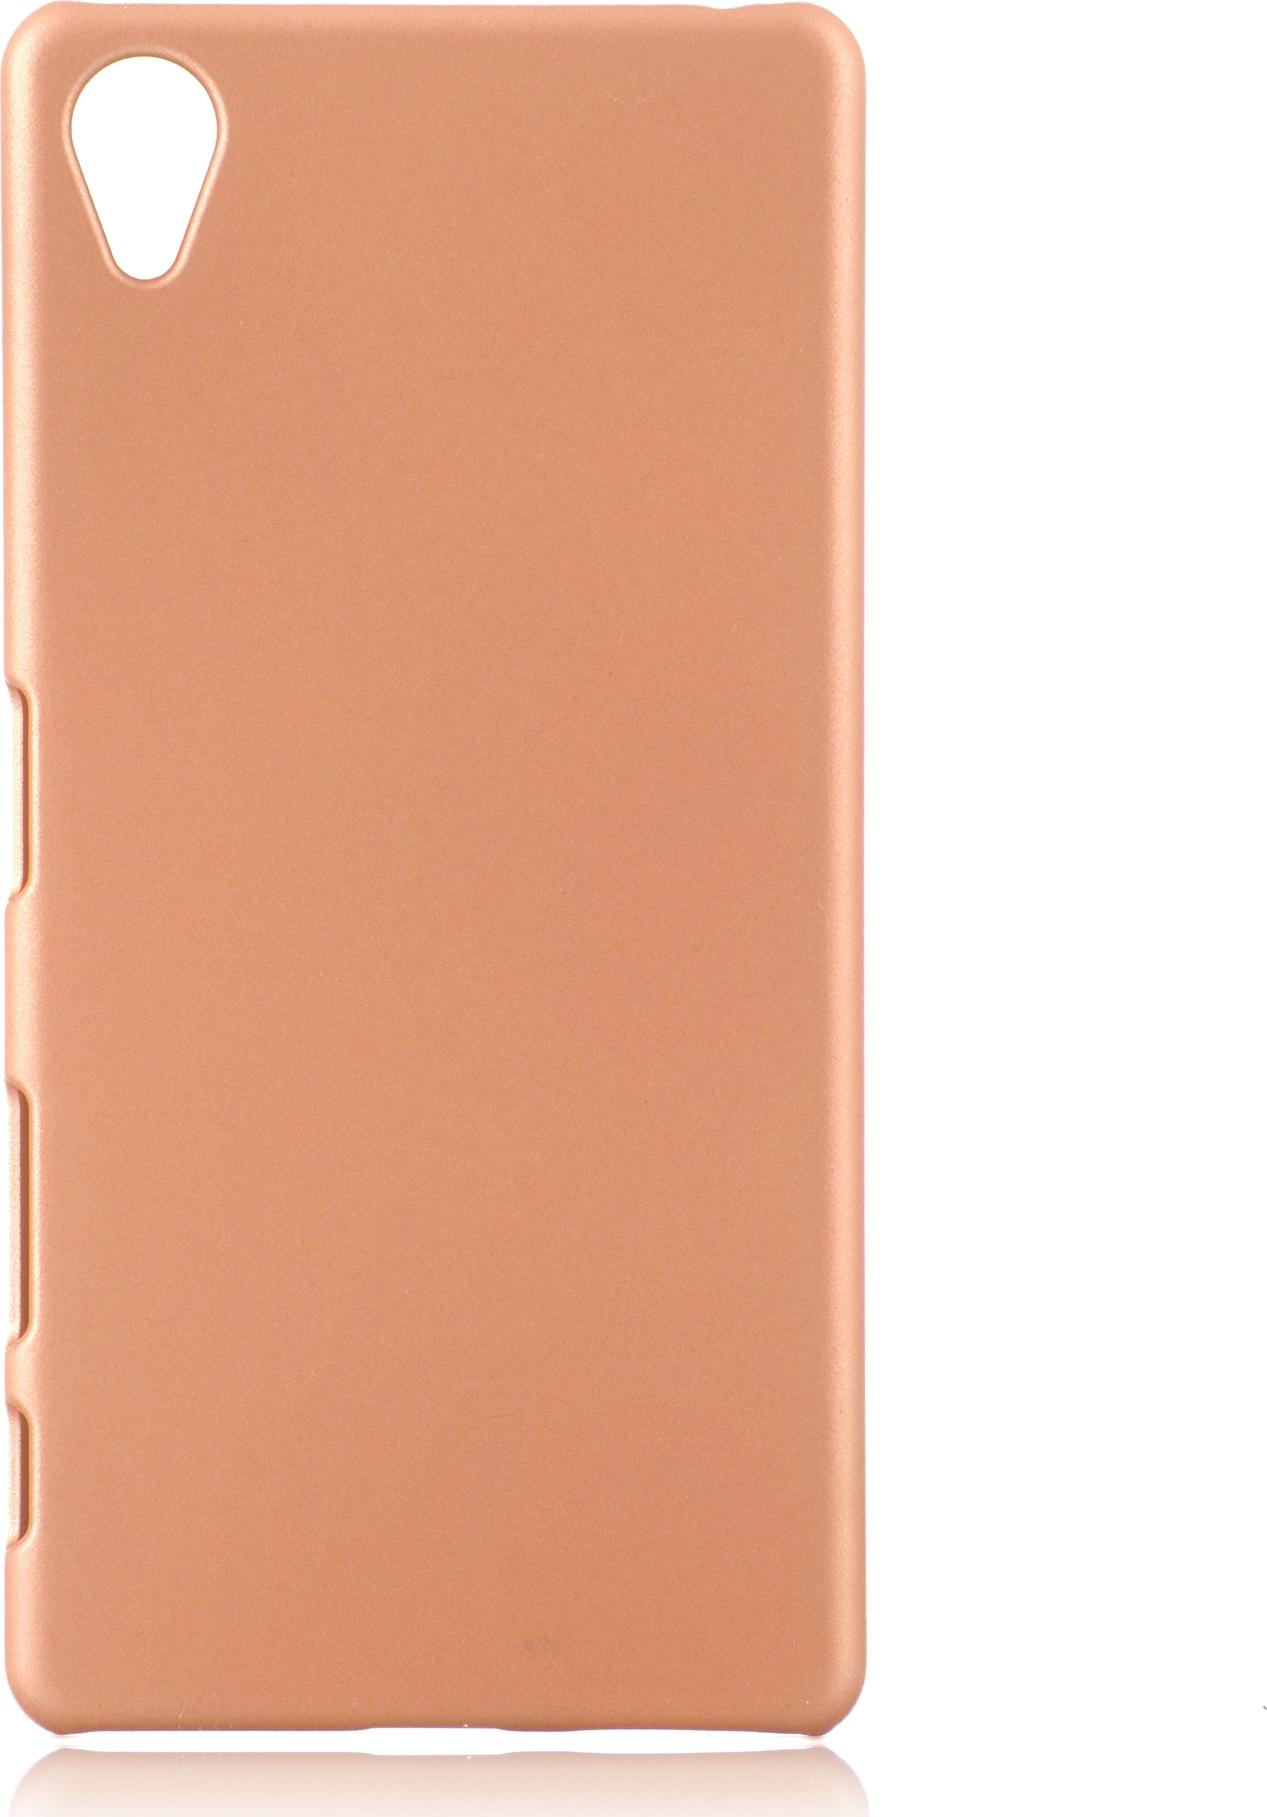 Чехол Brosco Soft-Touch для Sony Xperia X, розовый цена